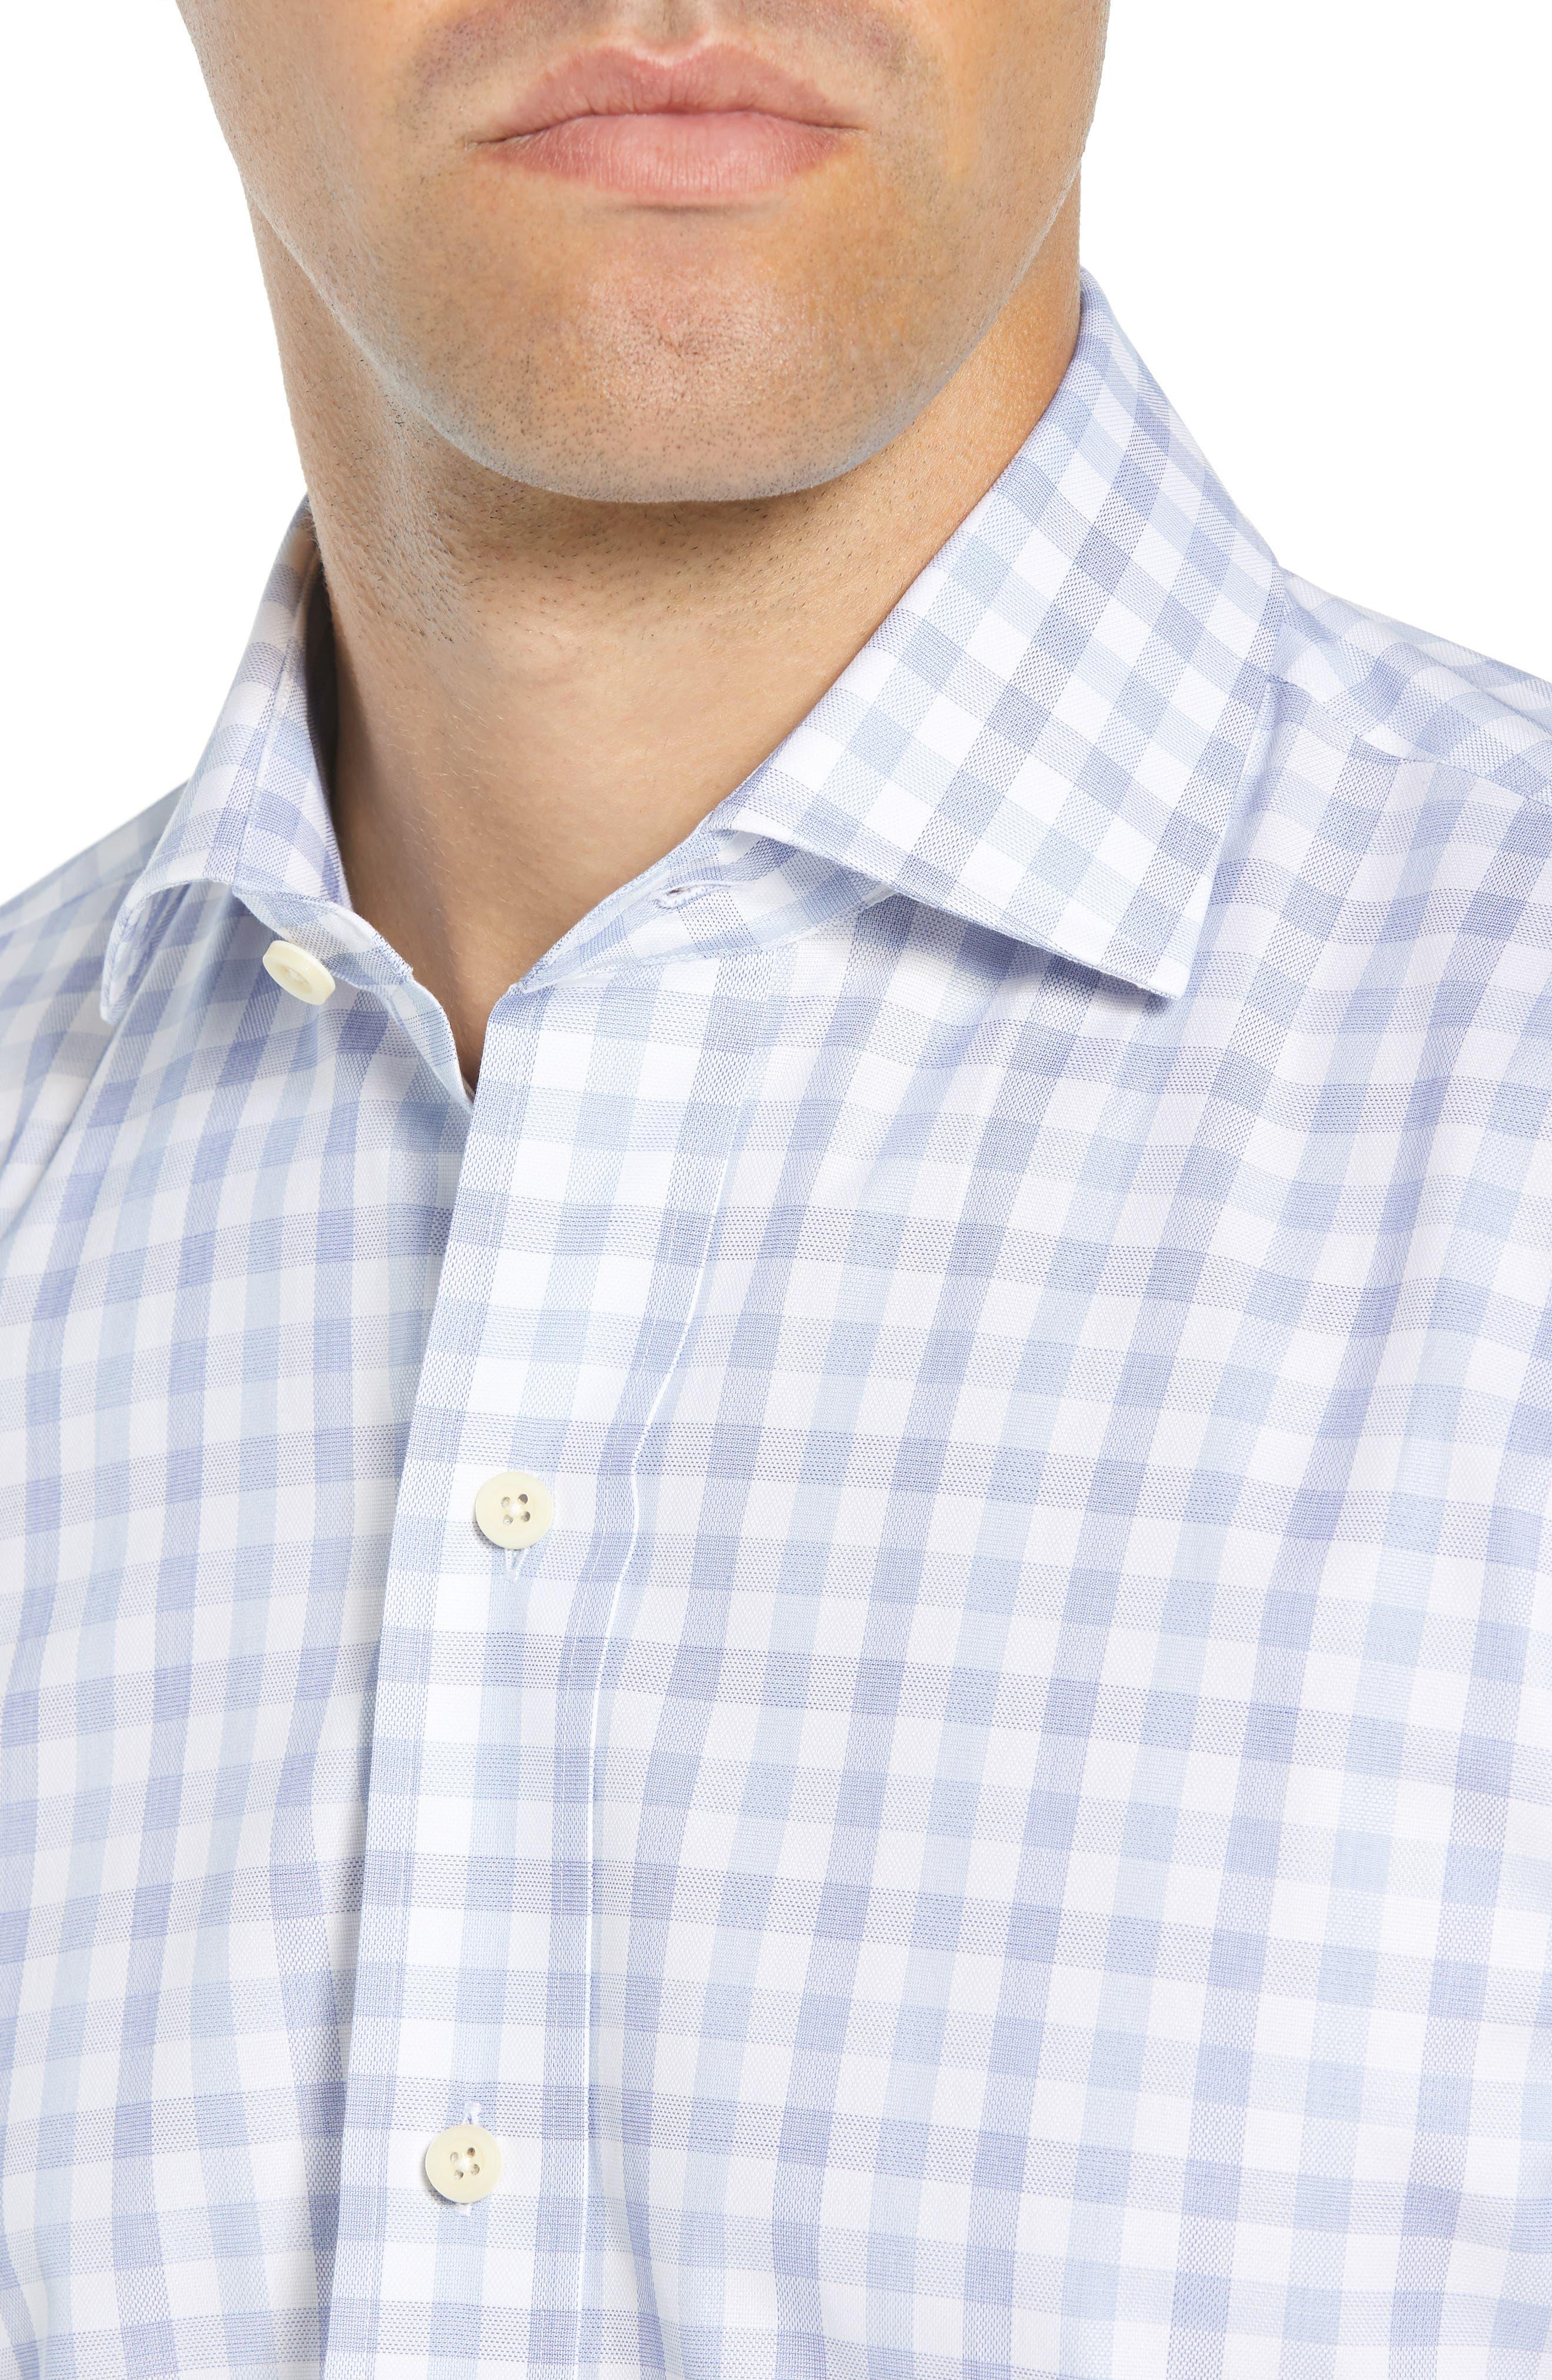 Corbly Trim Fit Check Dress Shirt,                             Alternate thumbnail 2, color,                             LIGHT BLUE